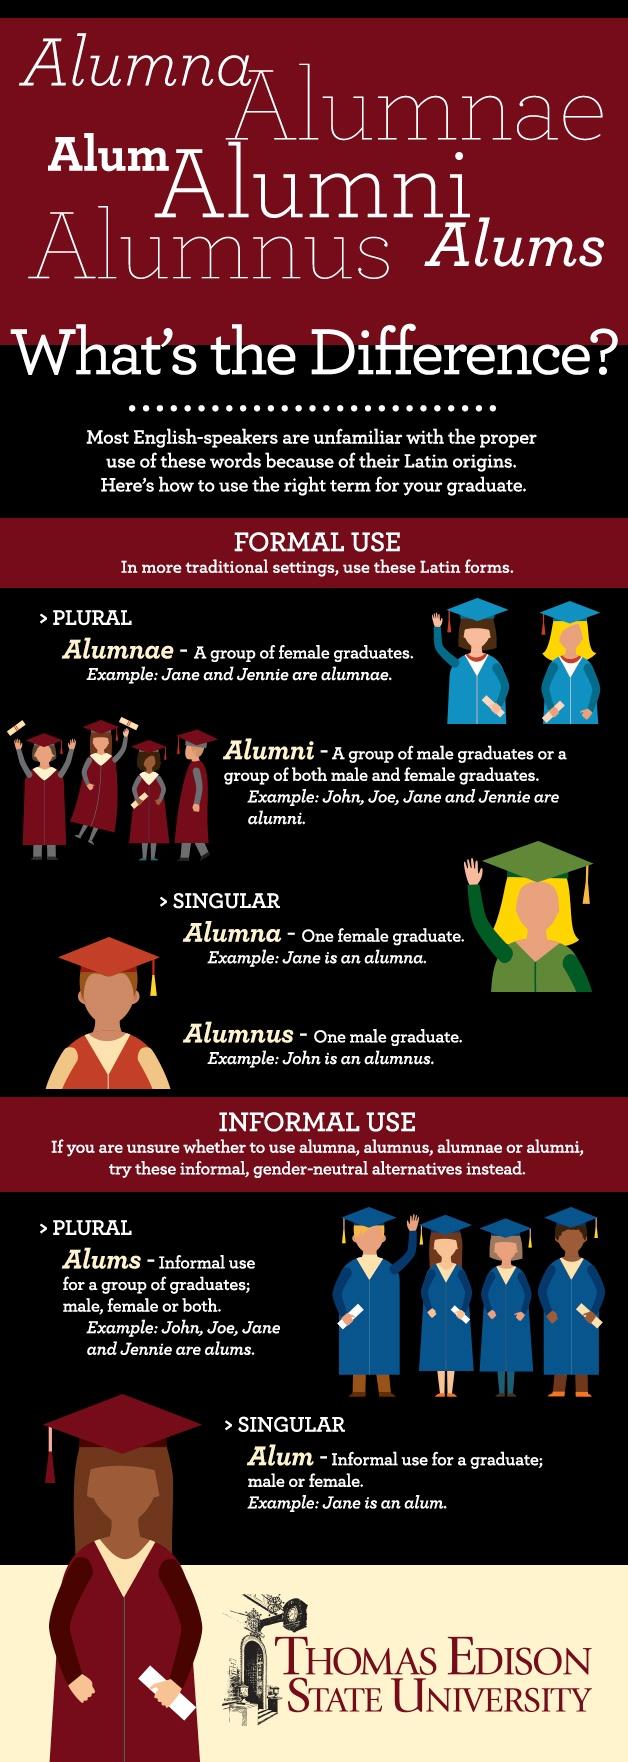 TESU_Alumni_Infographic.jpg